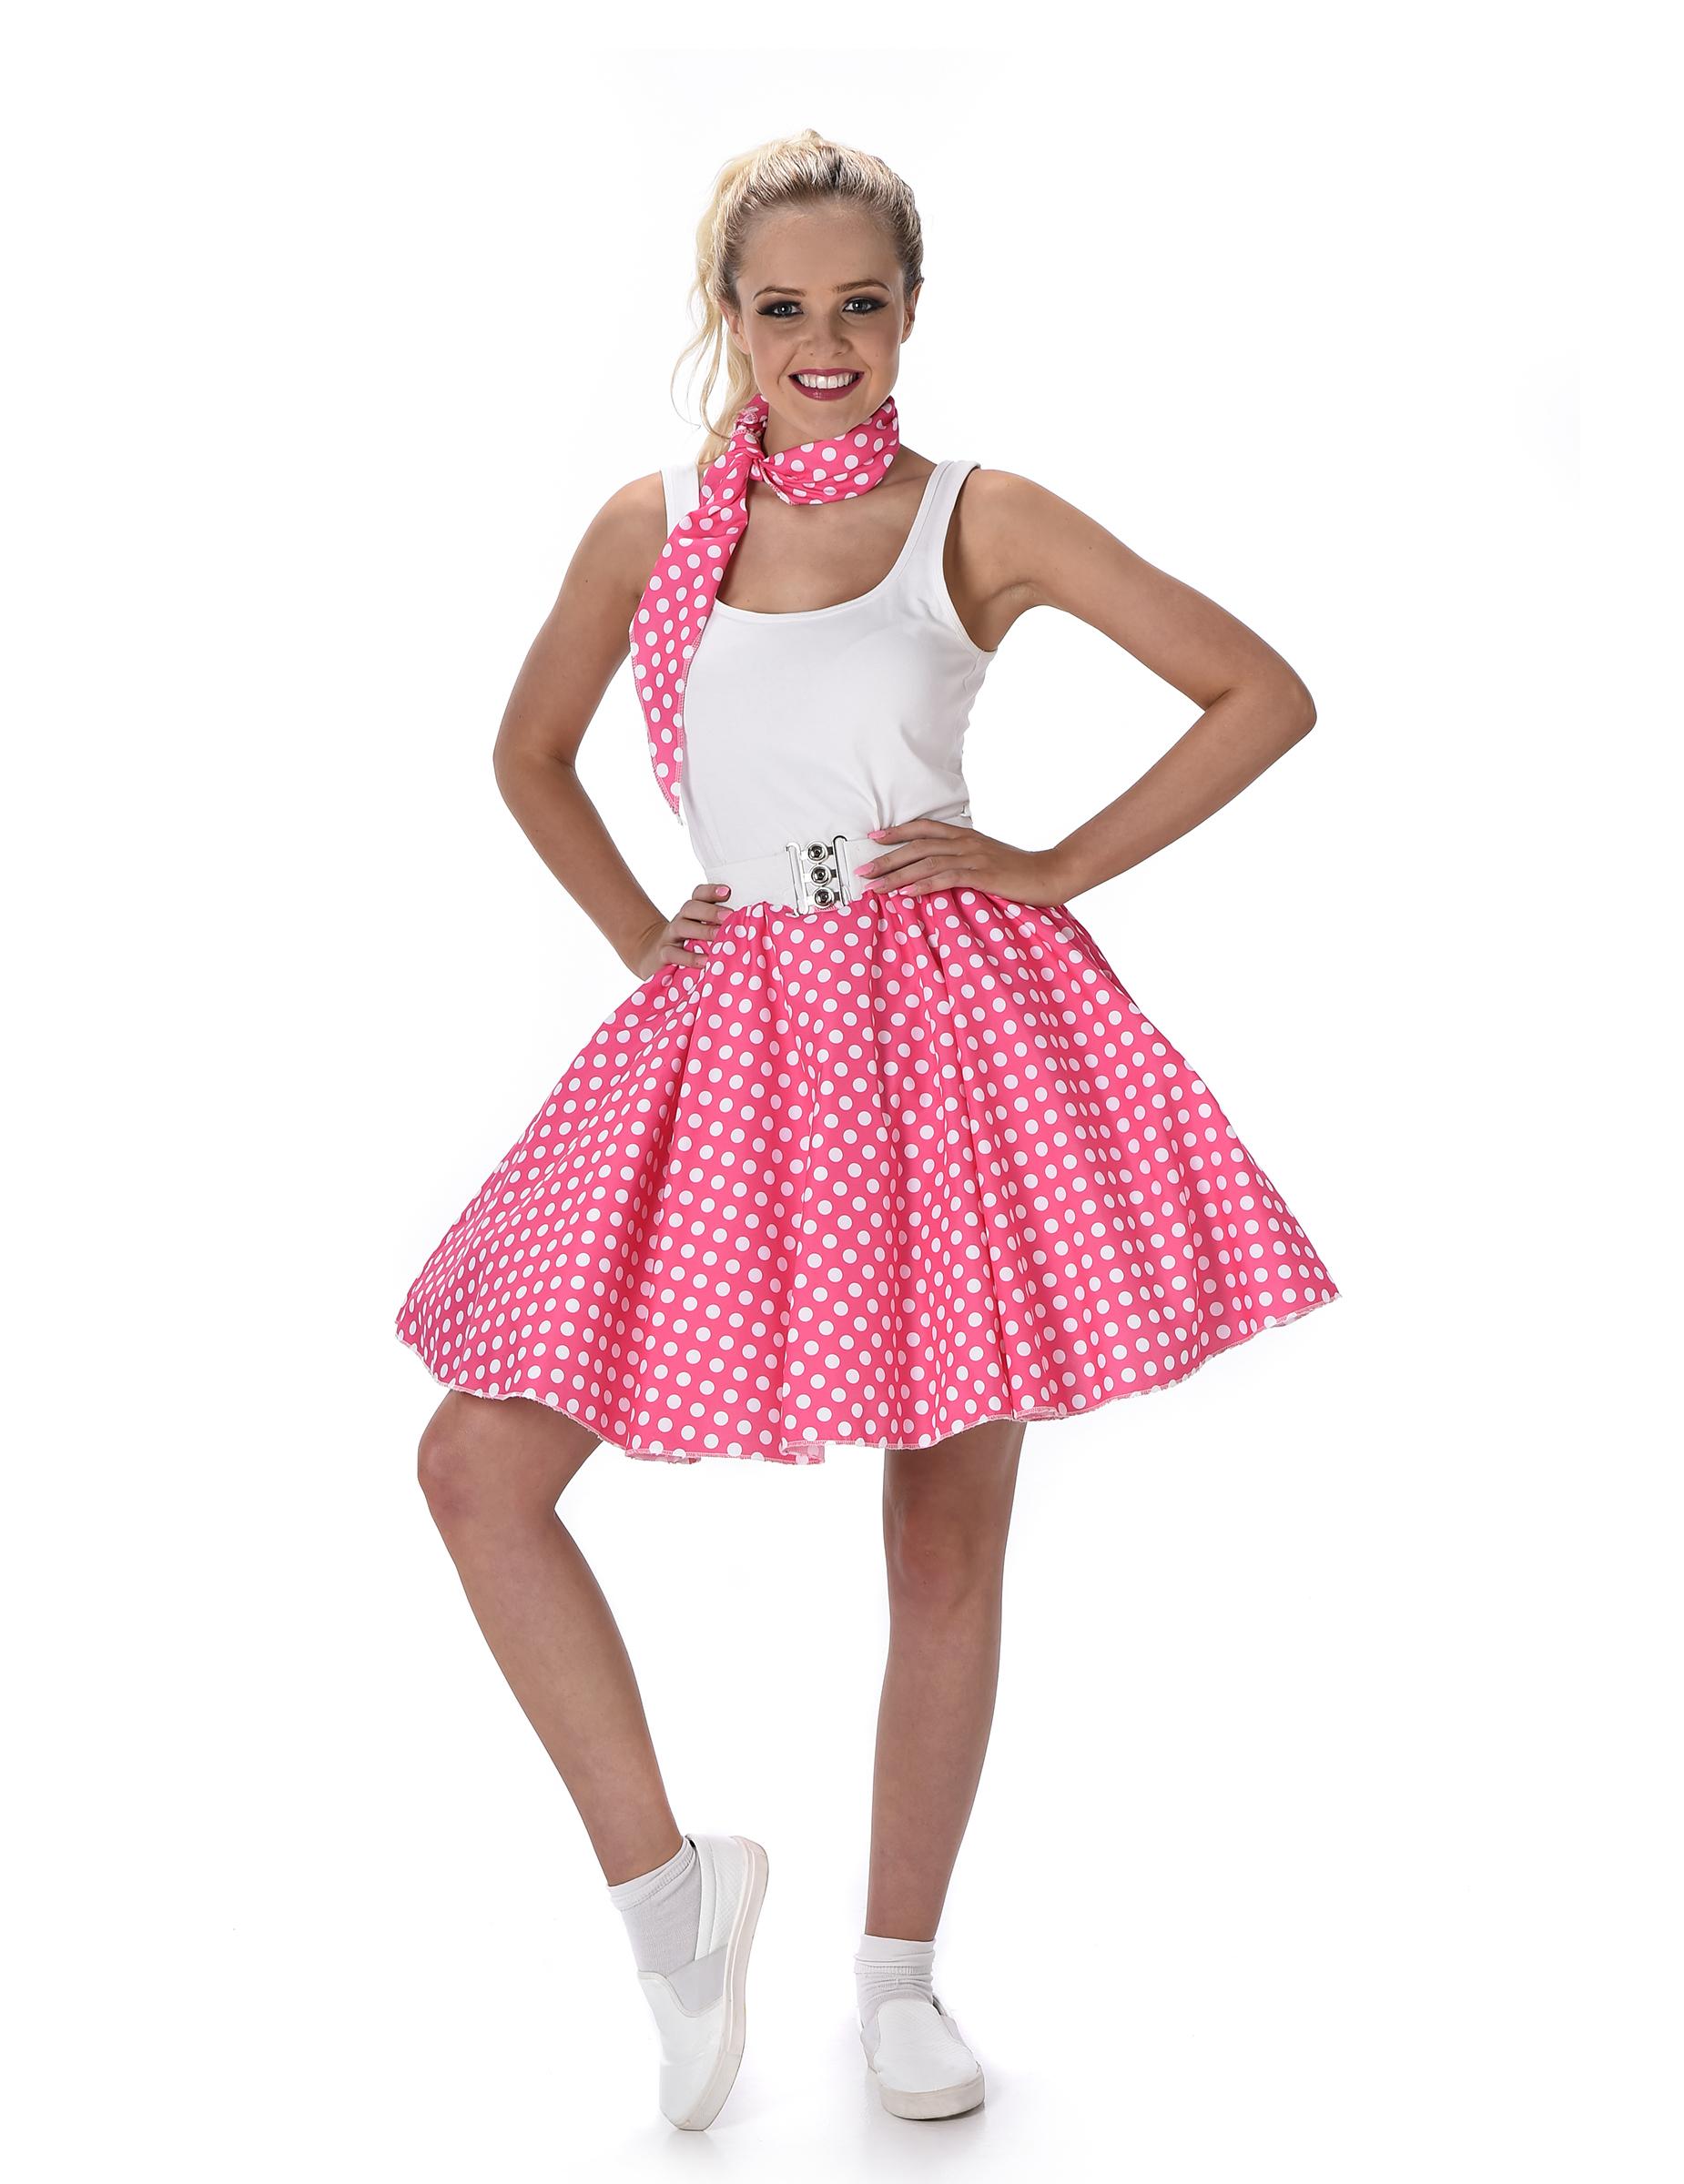 568b2765c4d5c Costume Anni  50 rosa a pois per donna  Costumi adulti